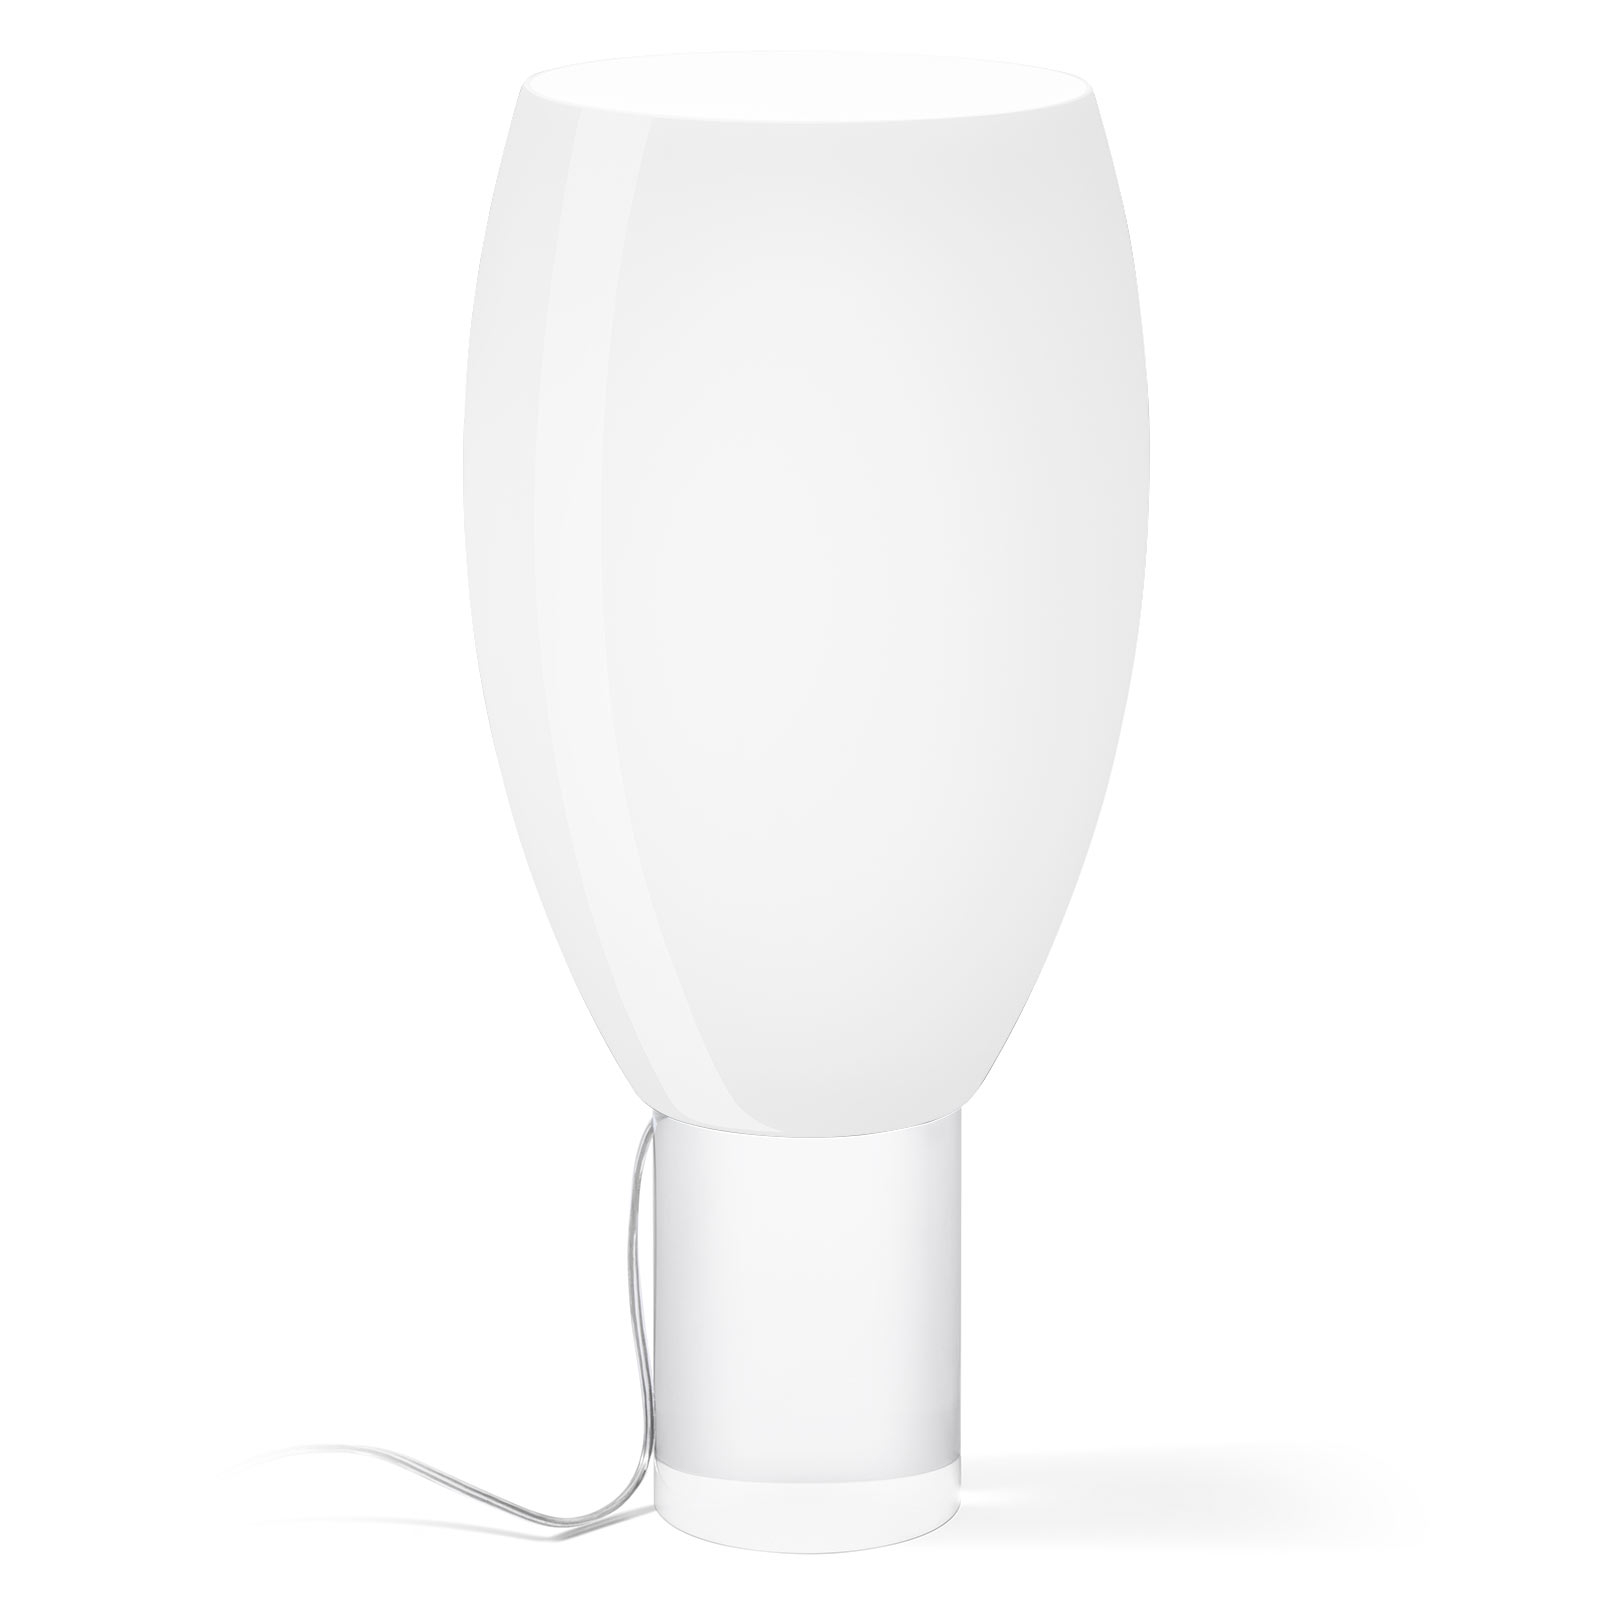 Foscarini Buds 1 lampe à poser, blanche bourgeon